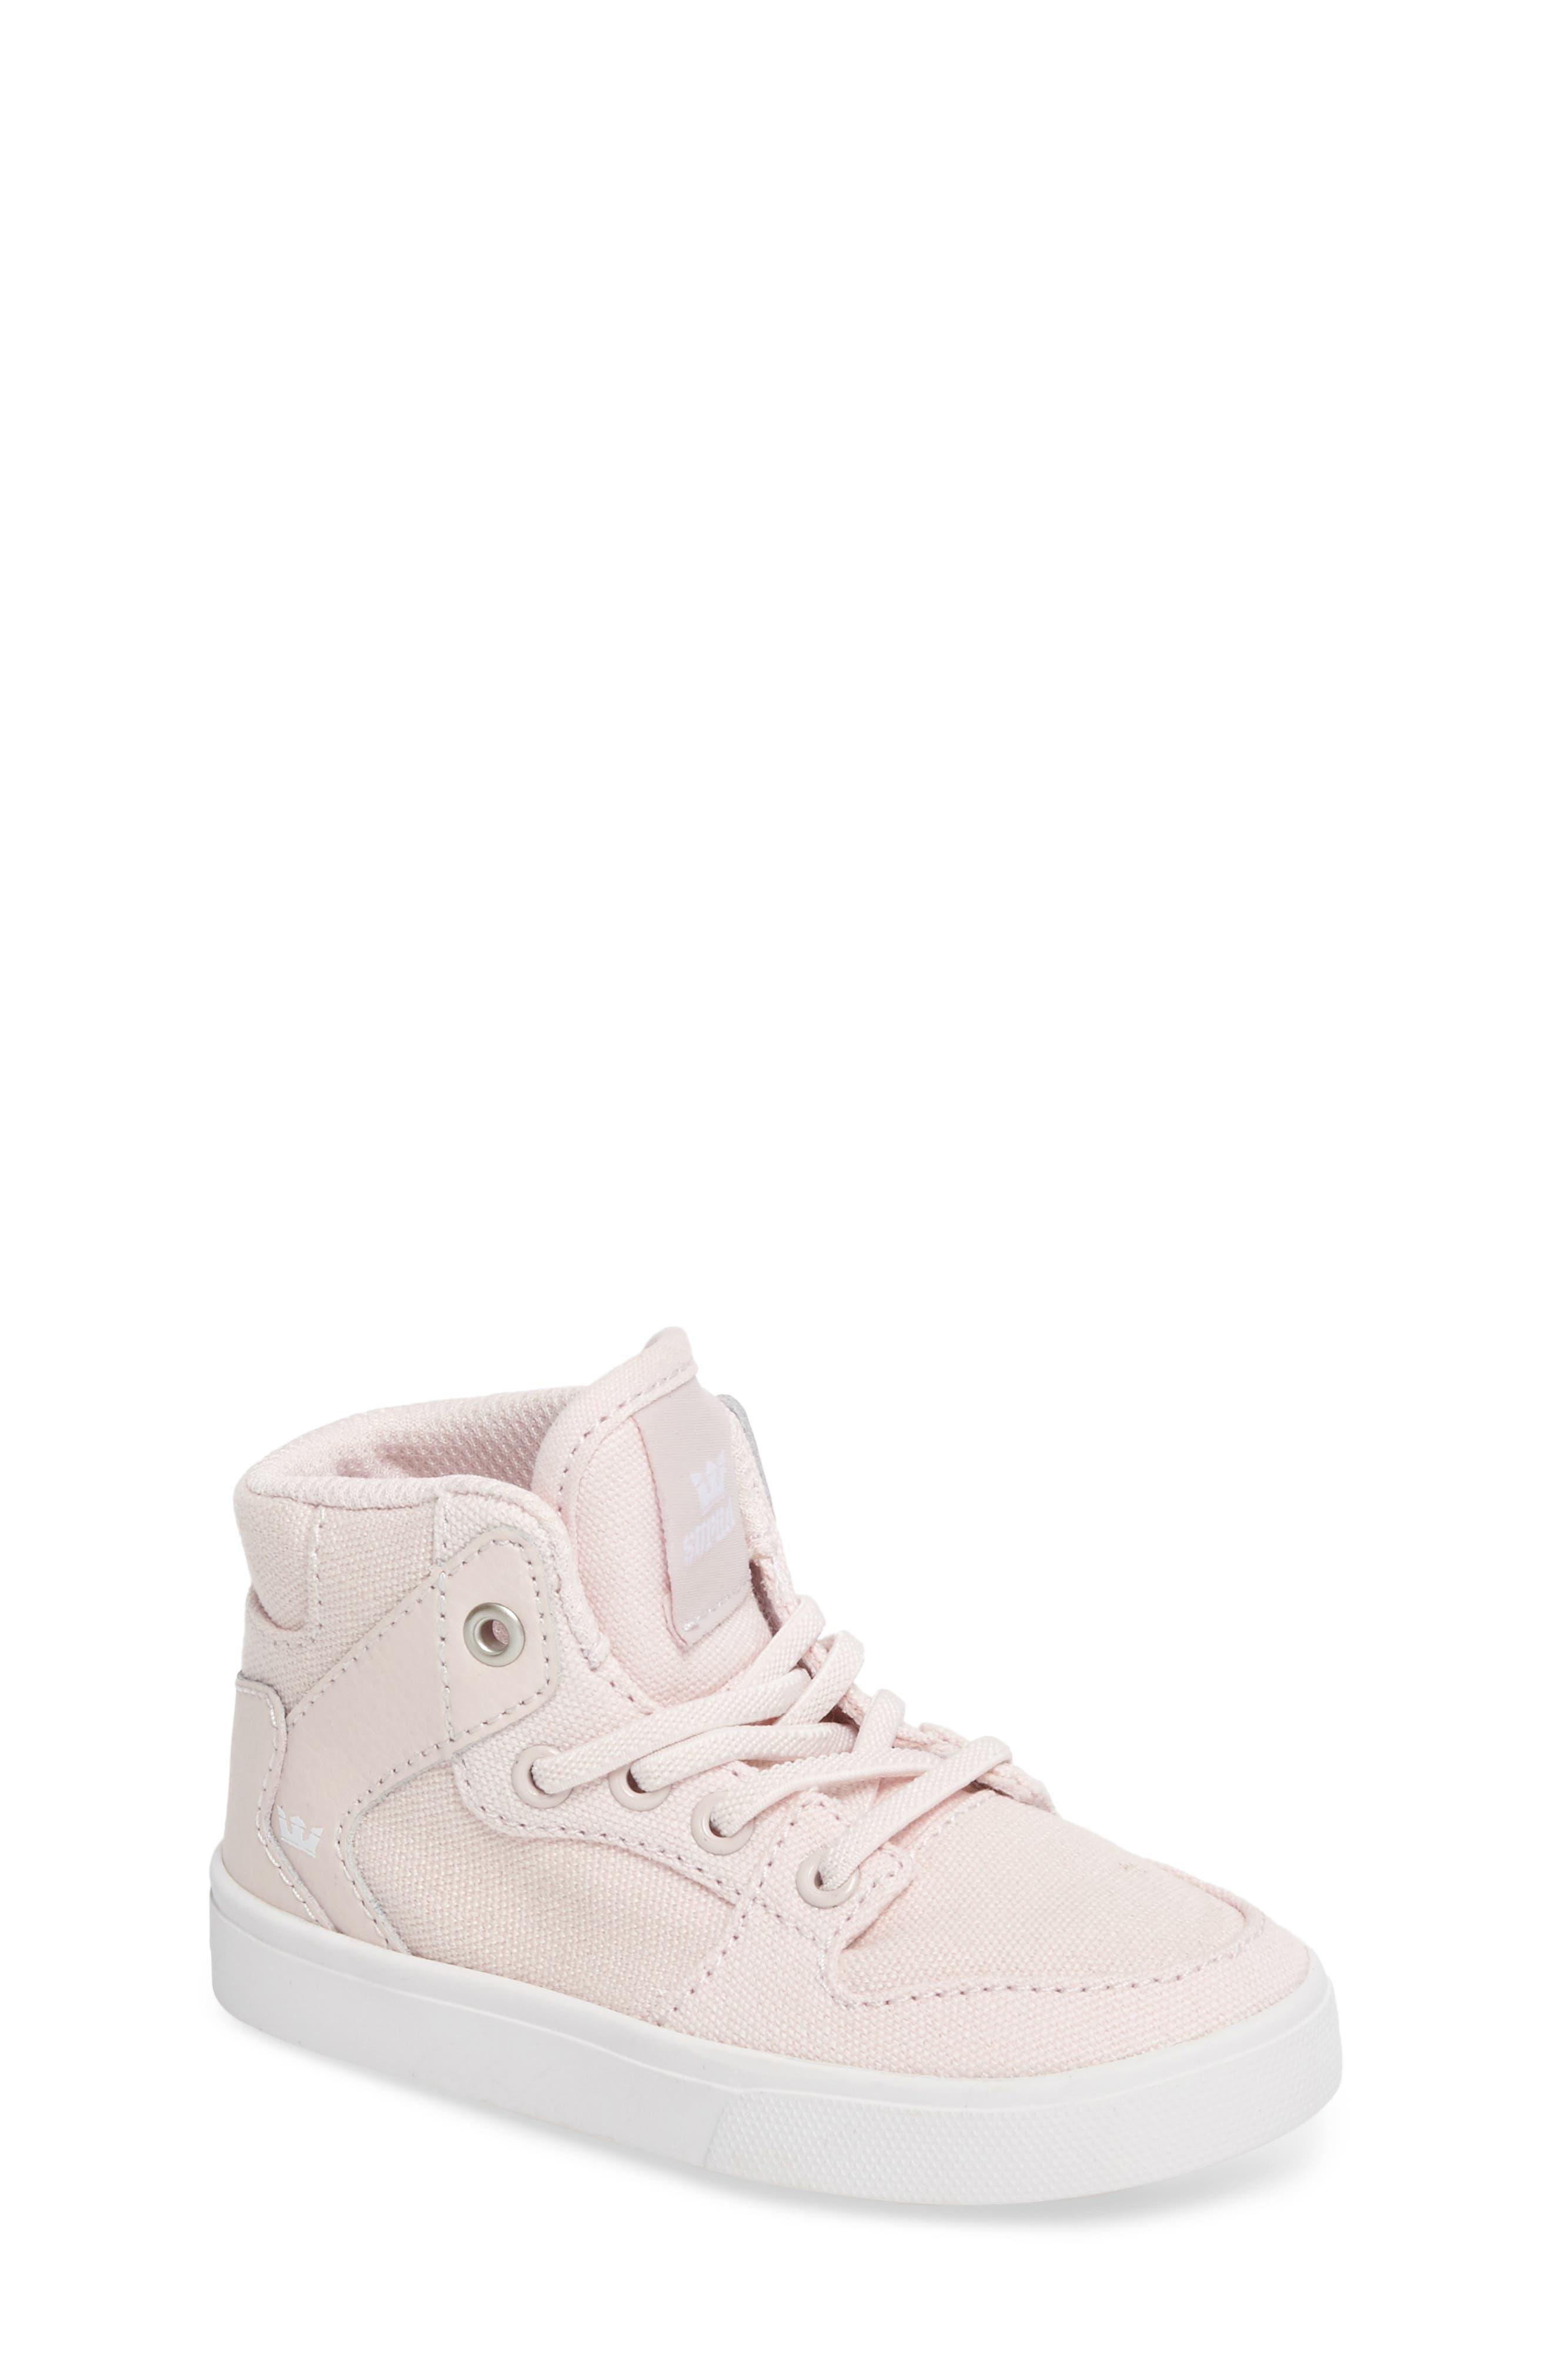 SUPRA Vaider High Top Sneaker